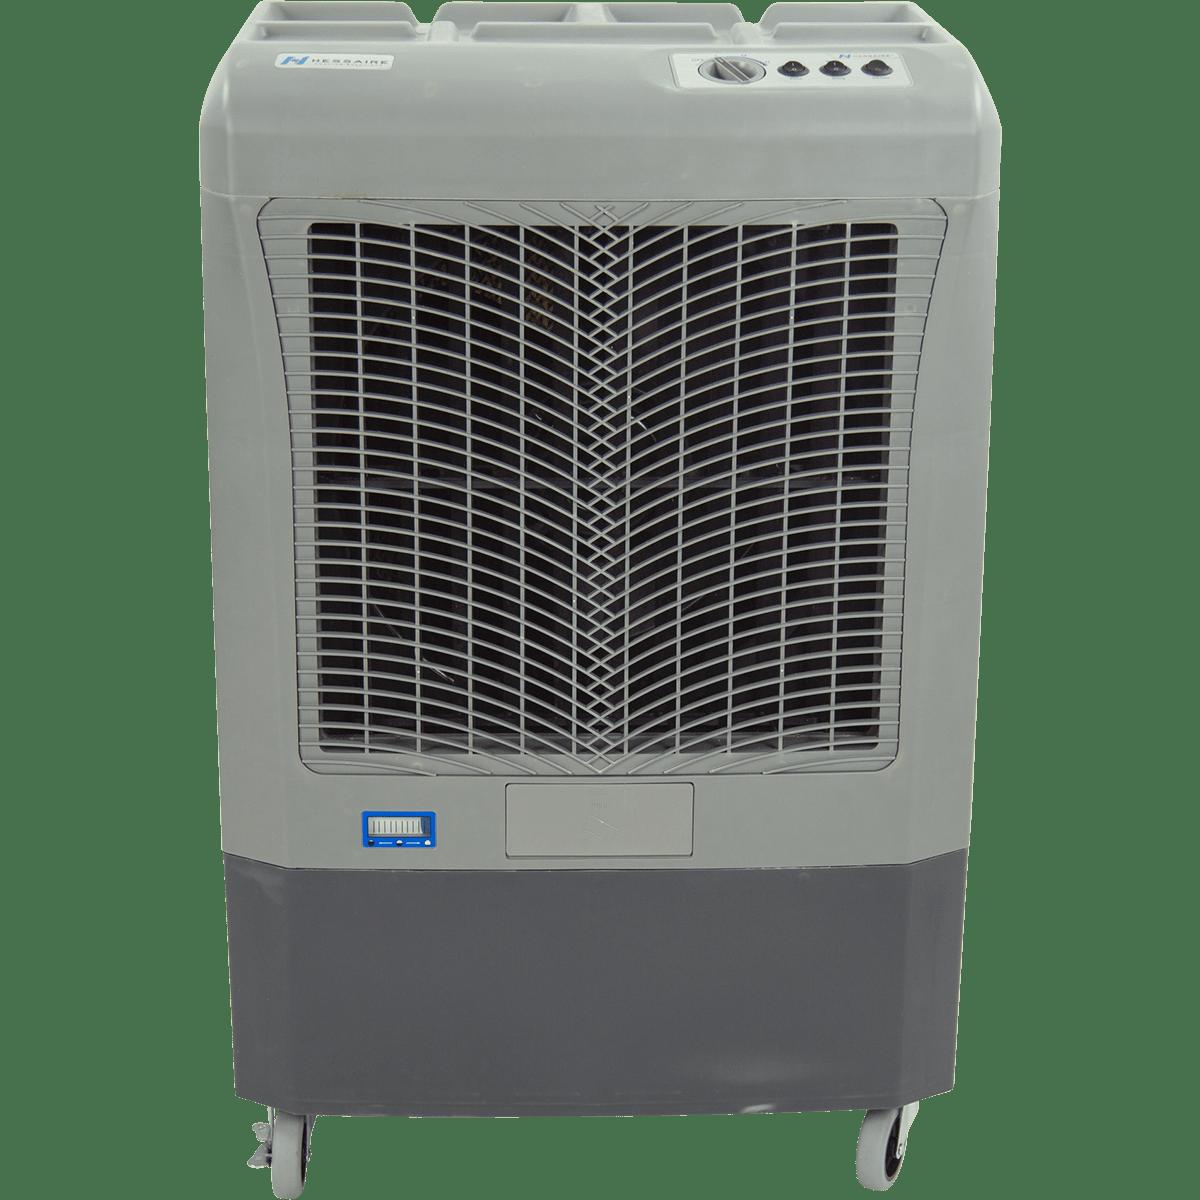 Hessaire MC37M 3,100 CFM 3-Speed Portable Evaporative Cooler he5453